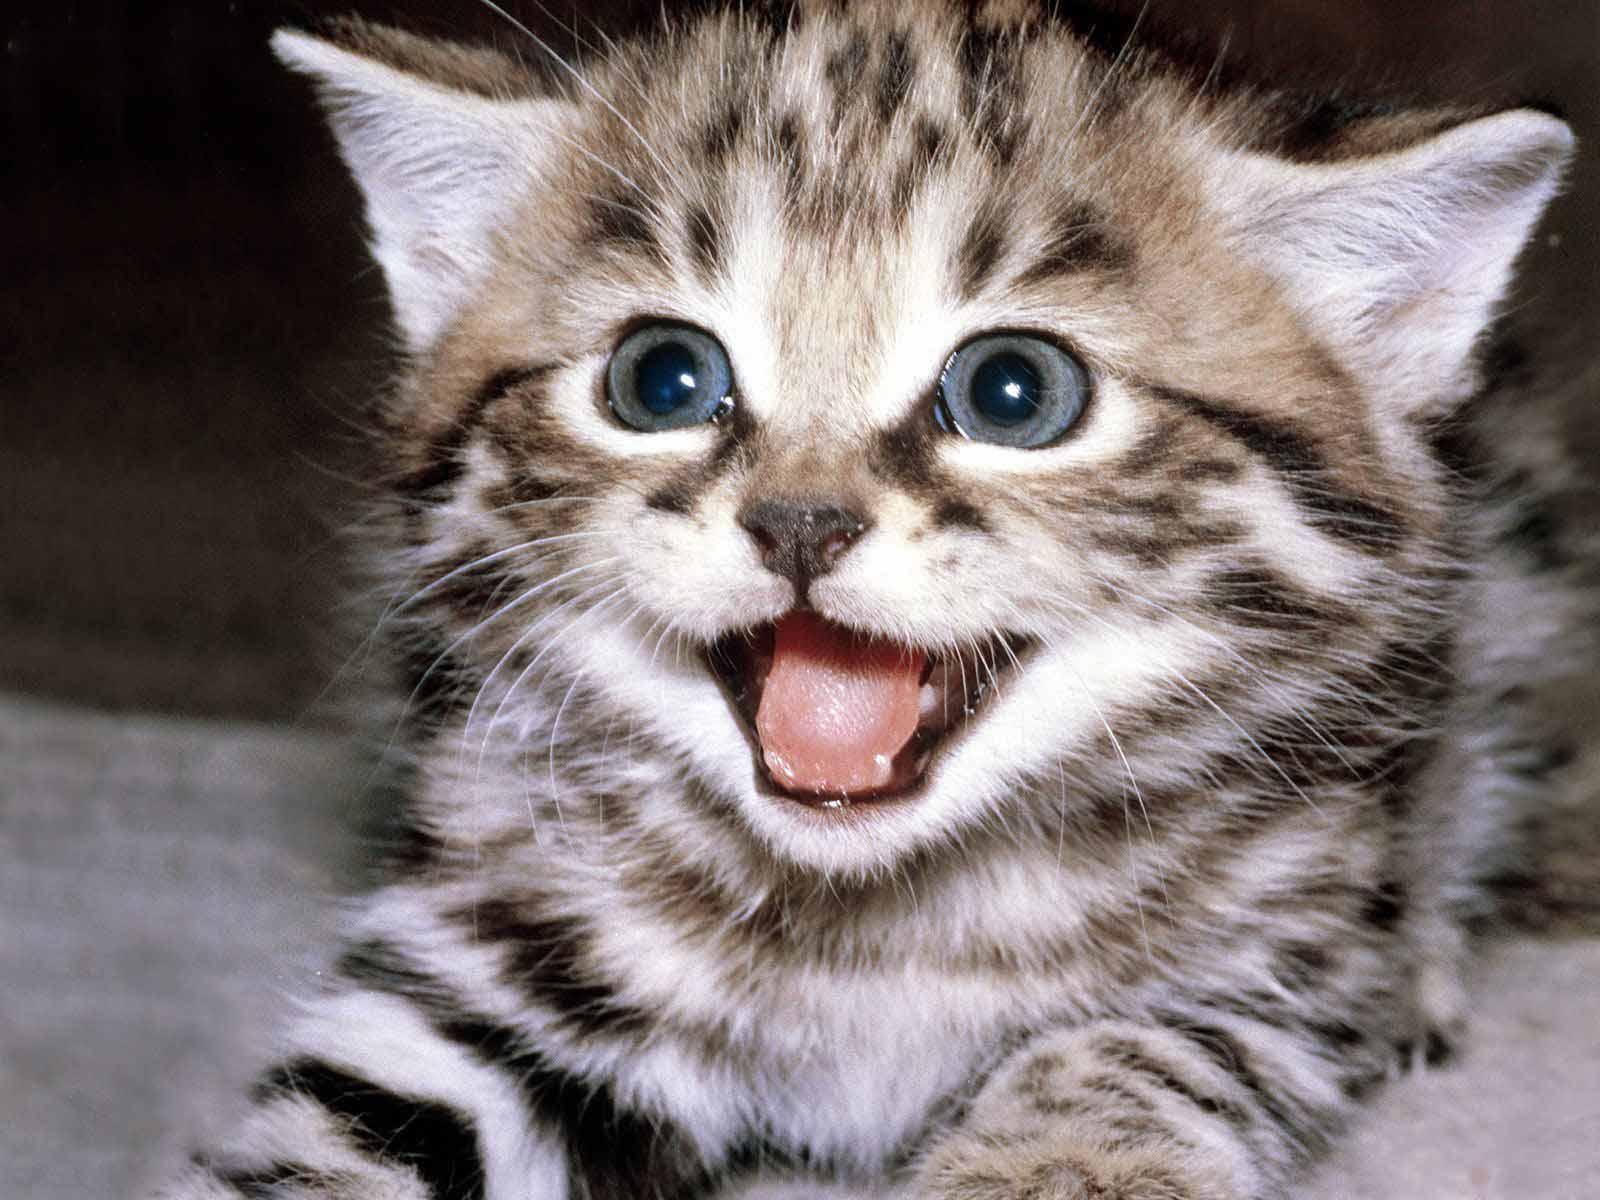 Can Cats Hurt Babies